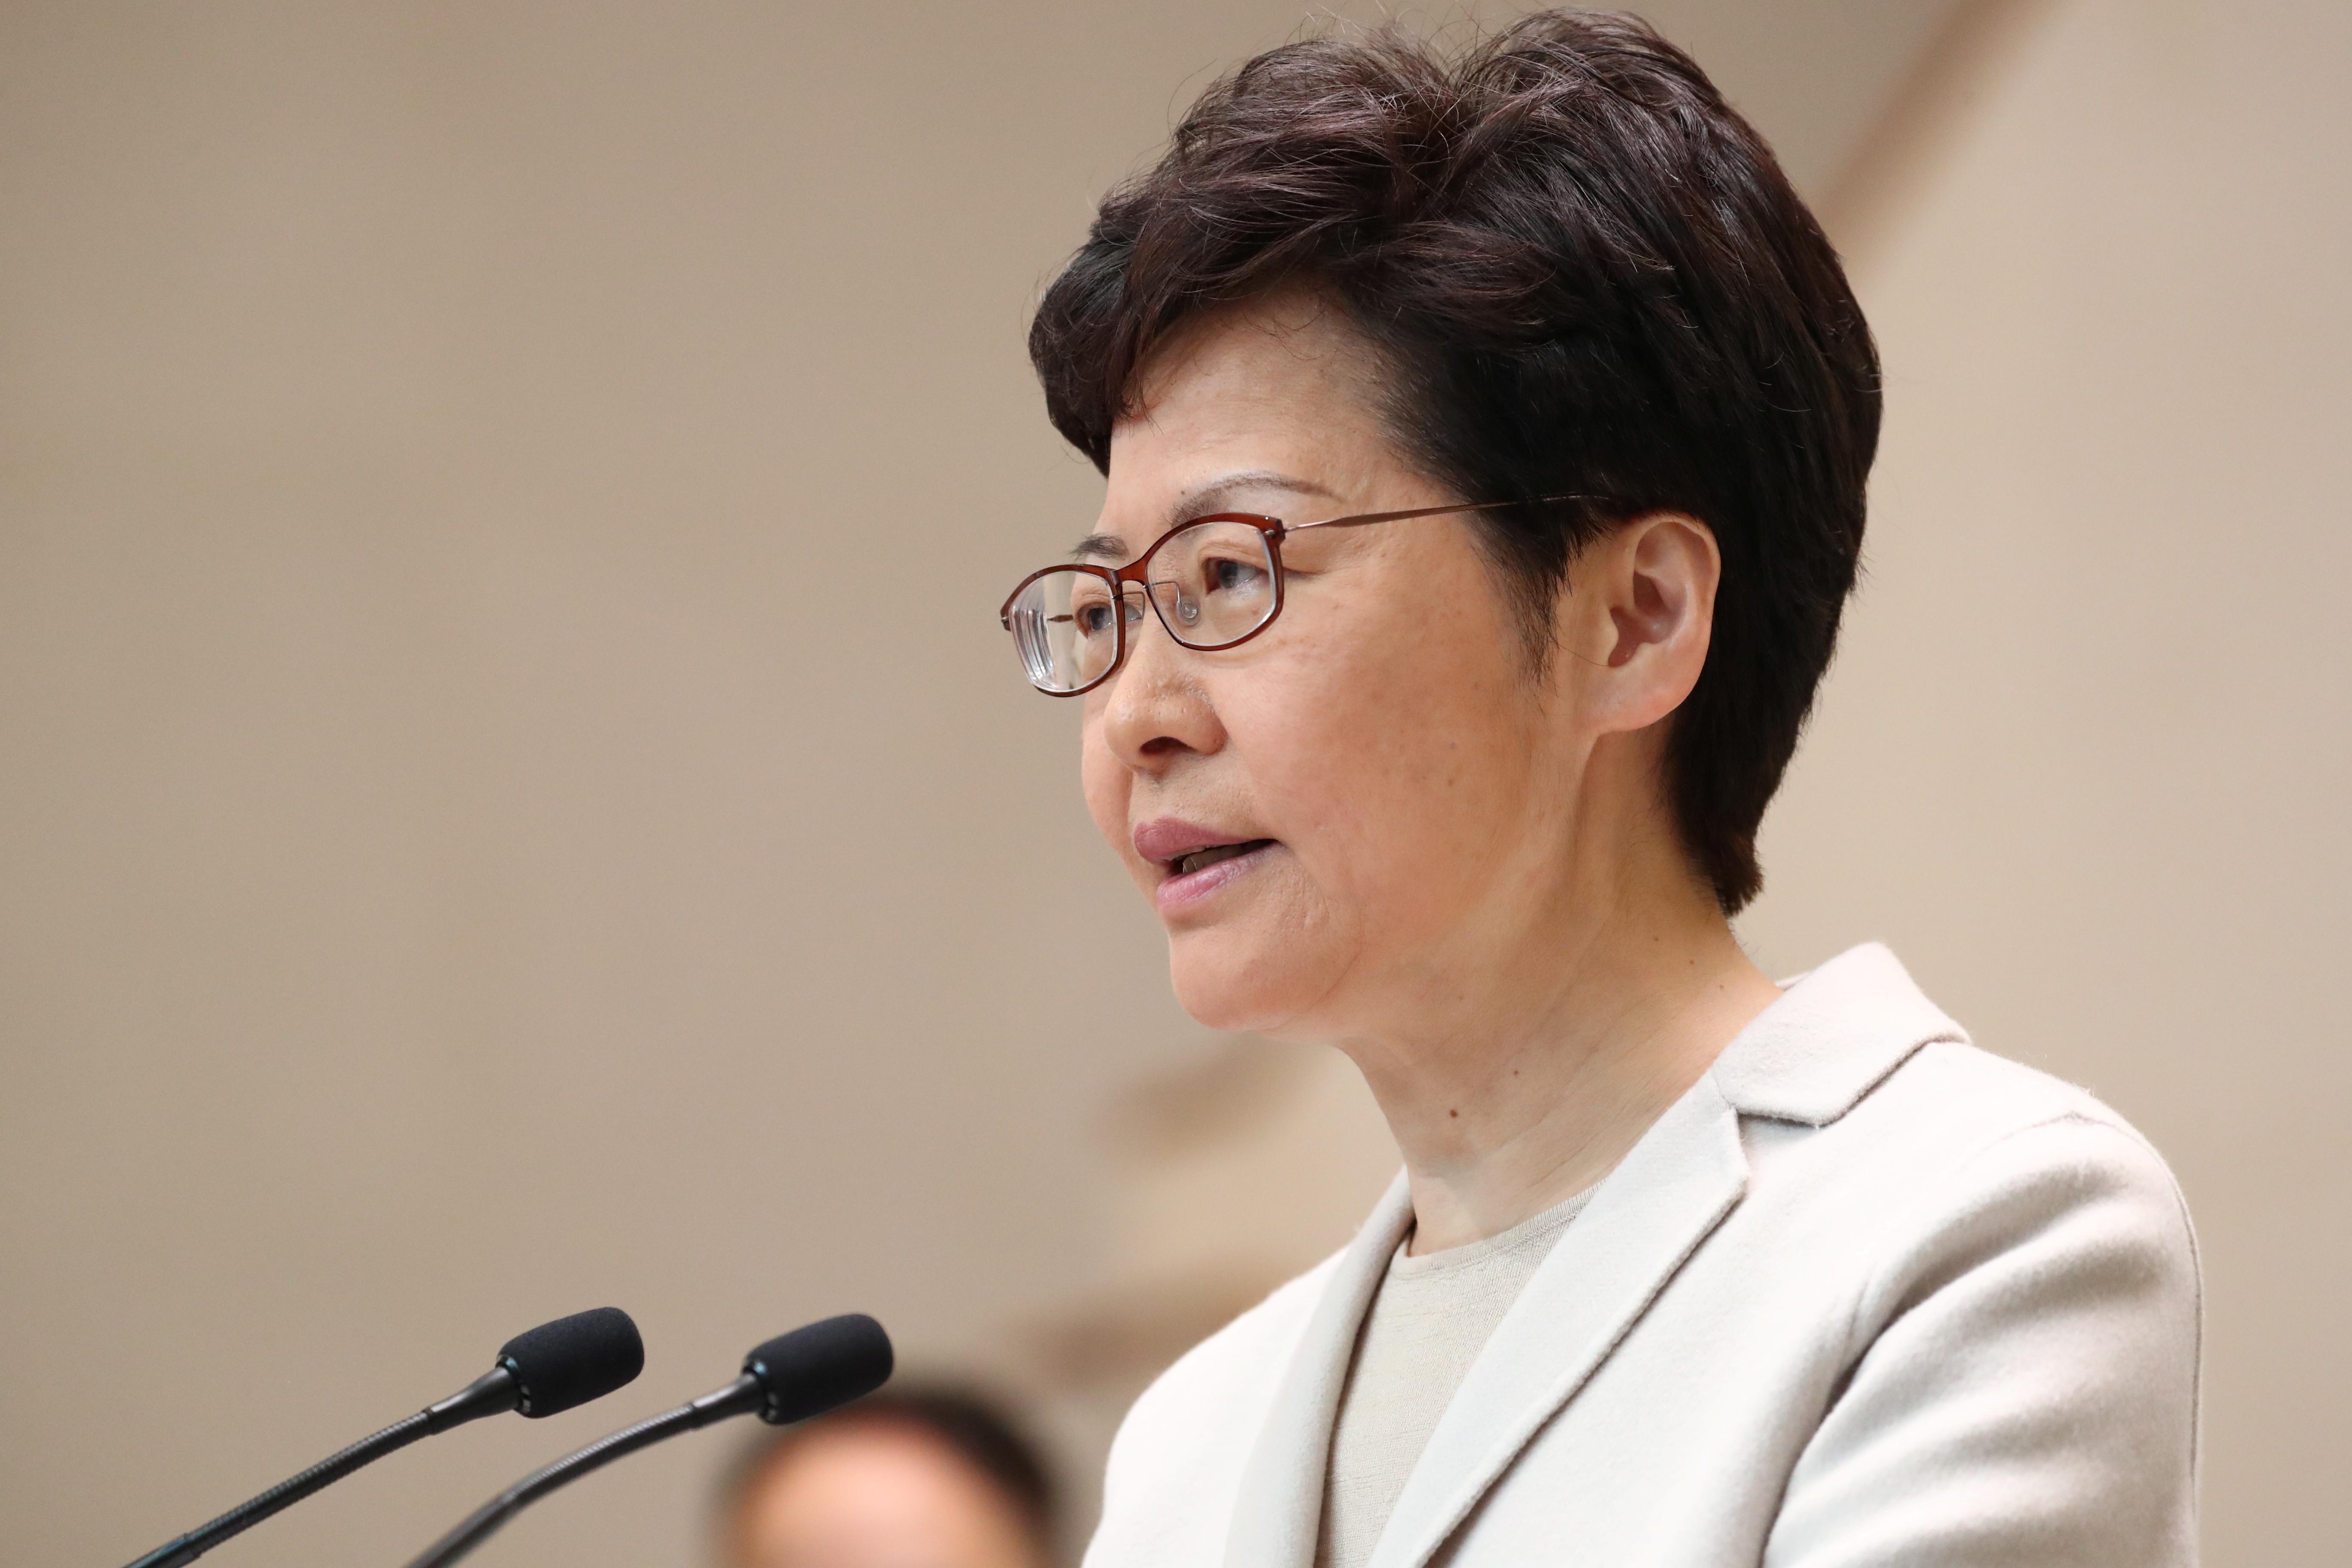 Hong Kong cabinet reshuffle not an 'immediate task', Lam says